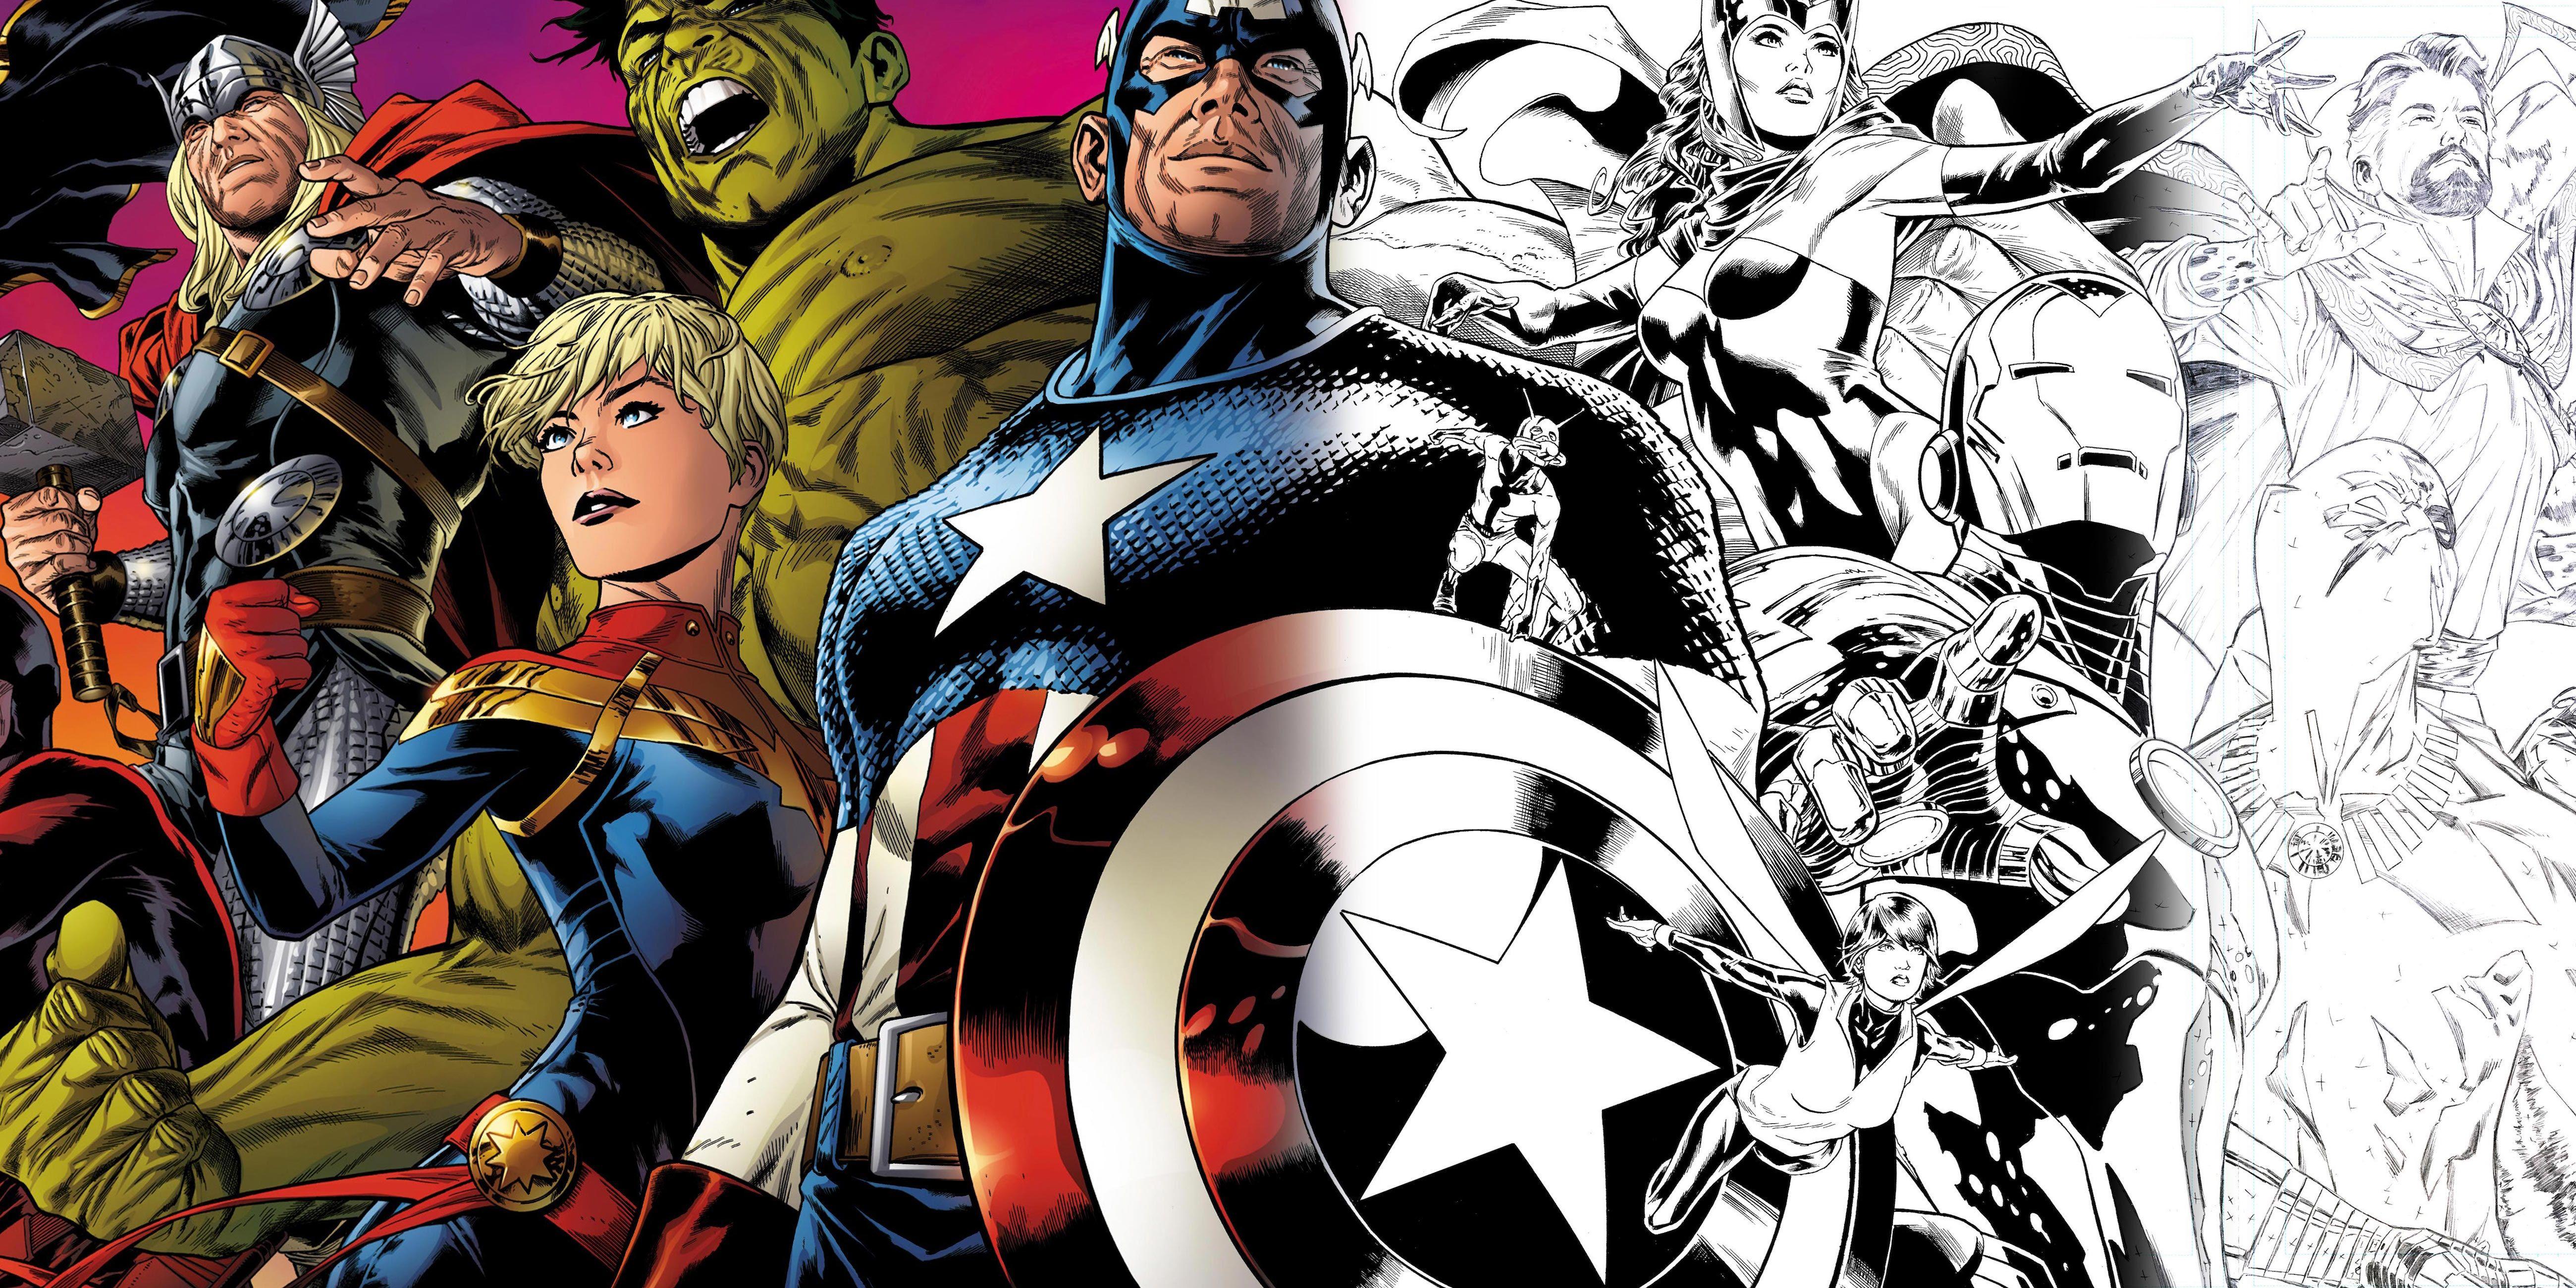 Avengers 1 000 000 Bc Marvel: Marvel Legacy Becomes 2017's Top Seller